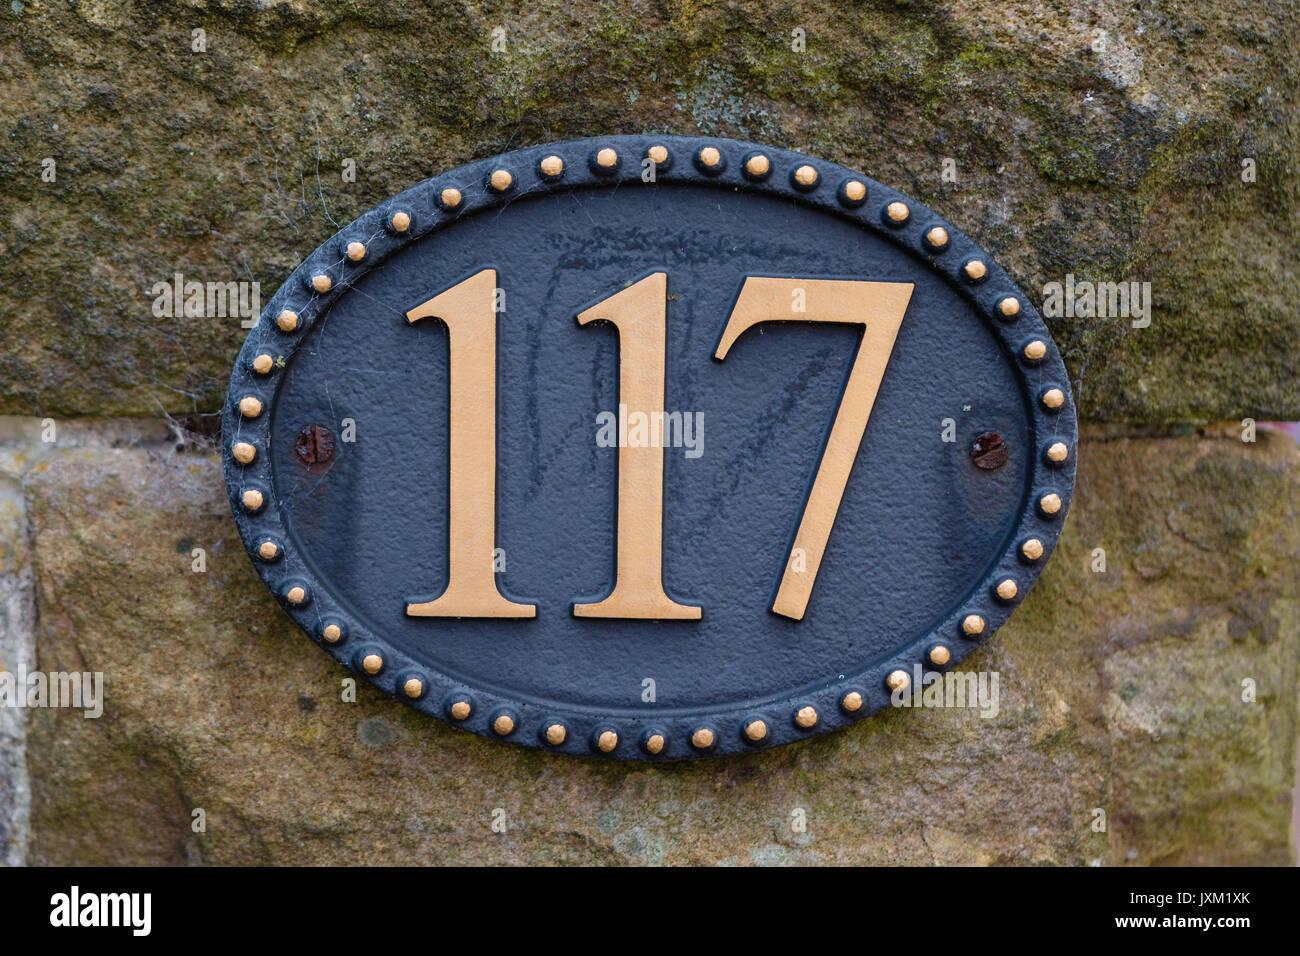 Numer 117 - Stock Image